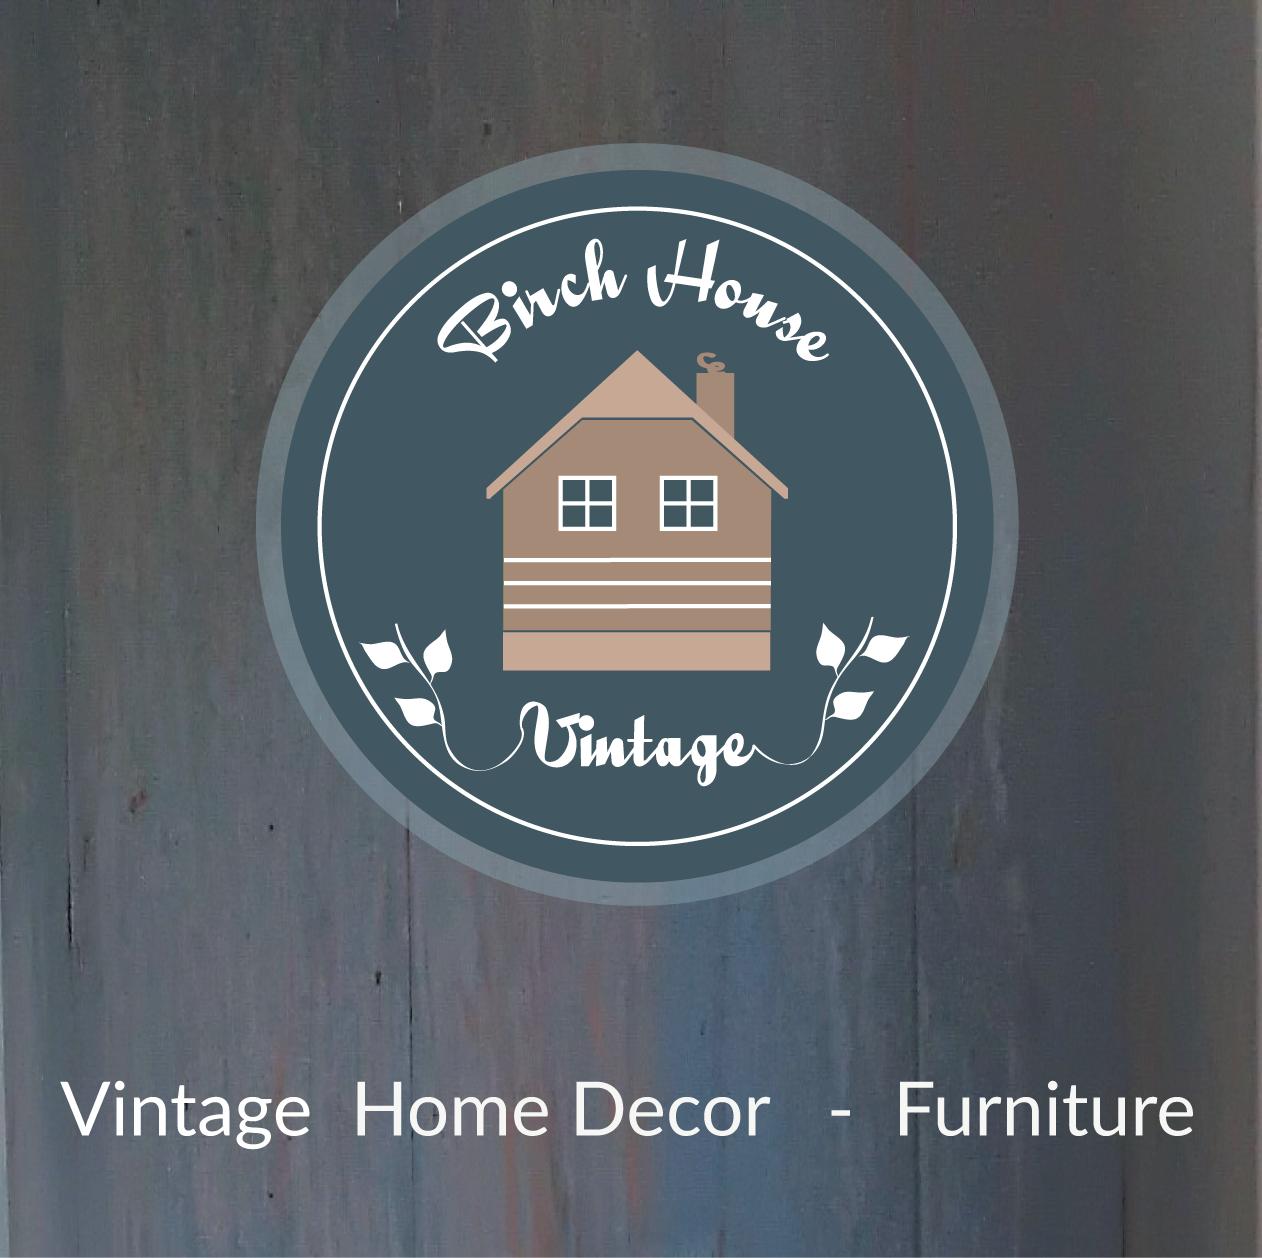 Marka Birch House Vintage